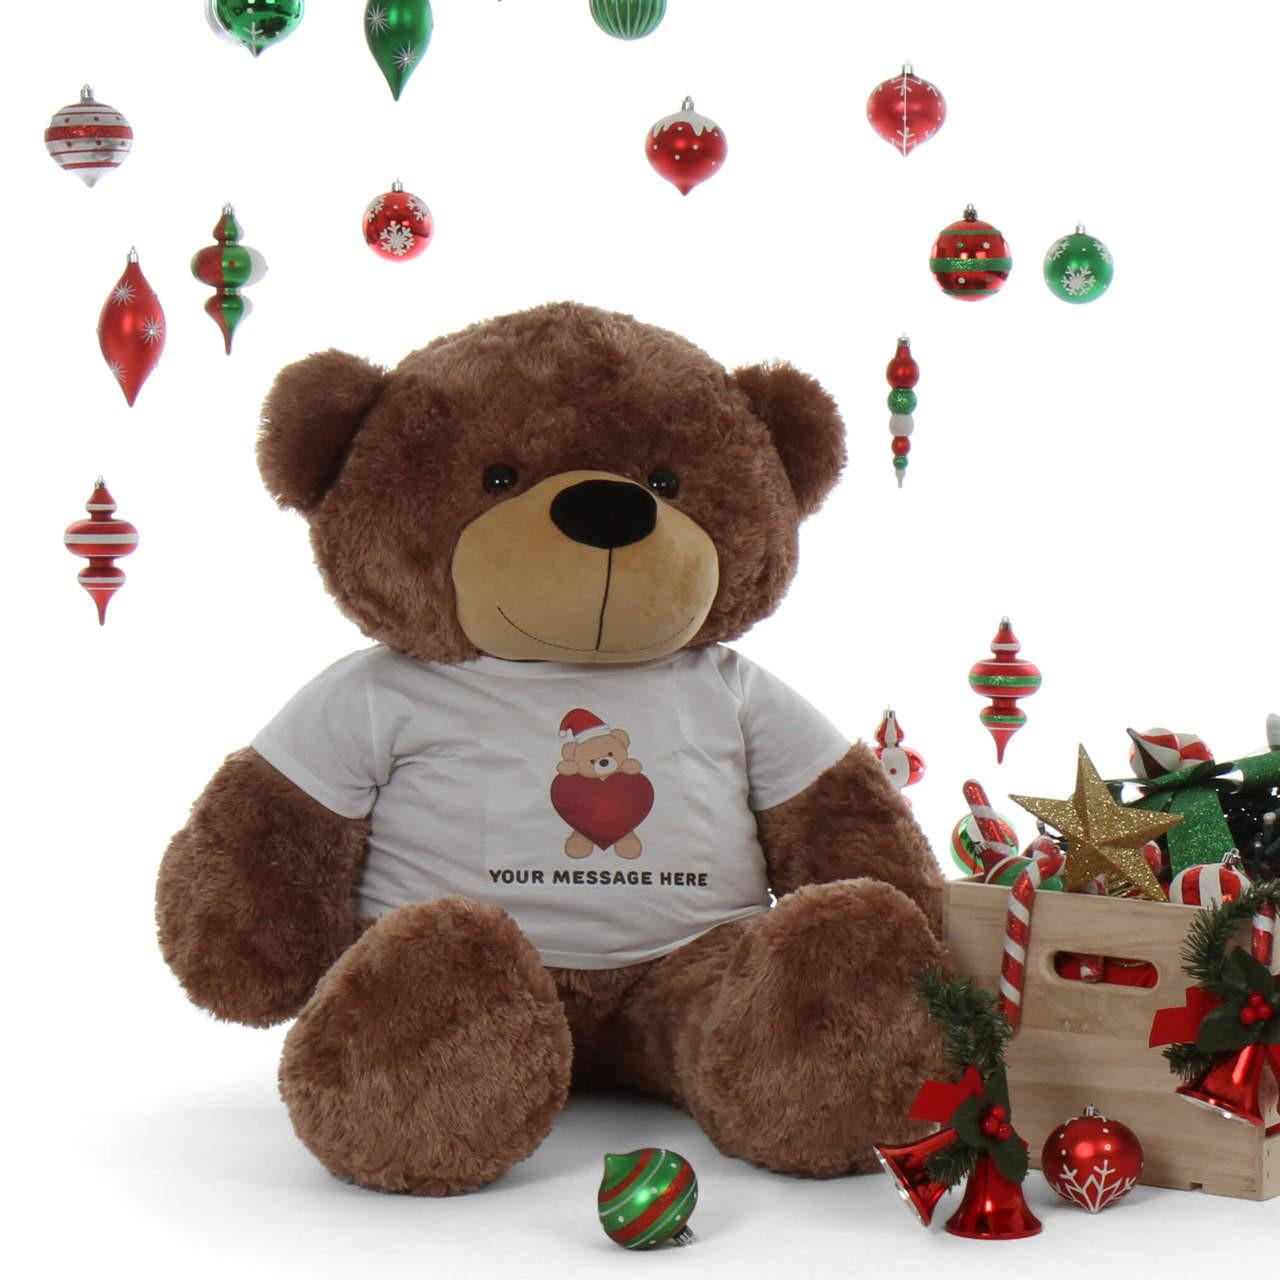 48in life size Personalized shirt huggable Christmas Teddy Bear Mocha Sunny Cuddles gift